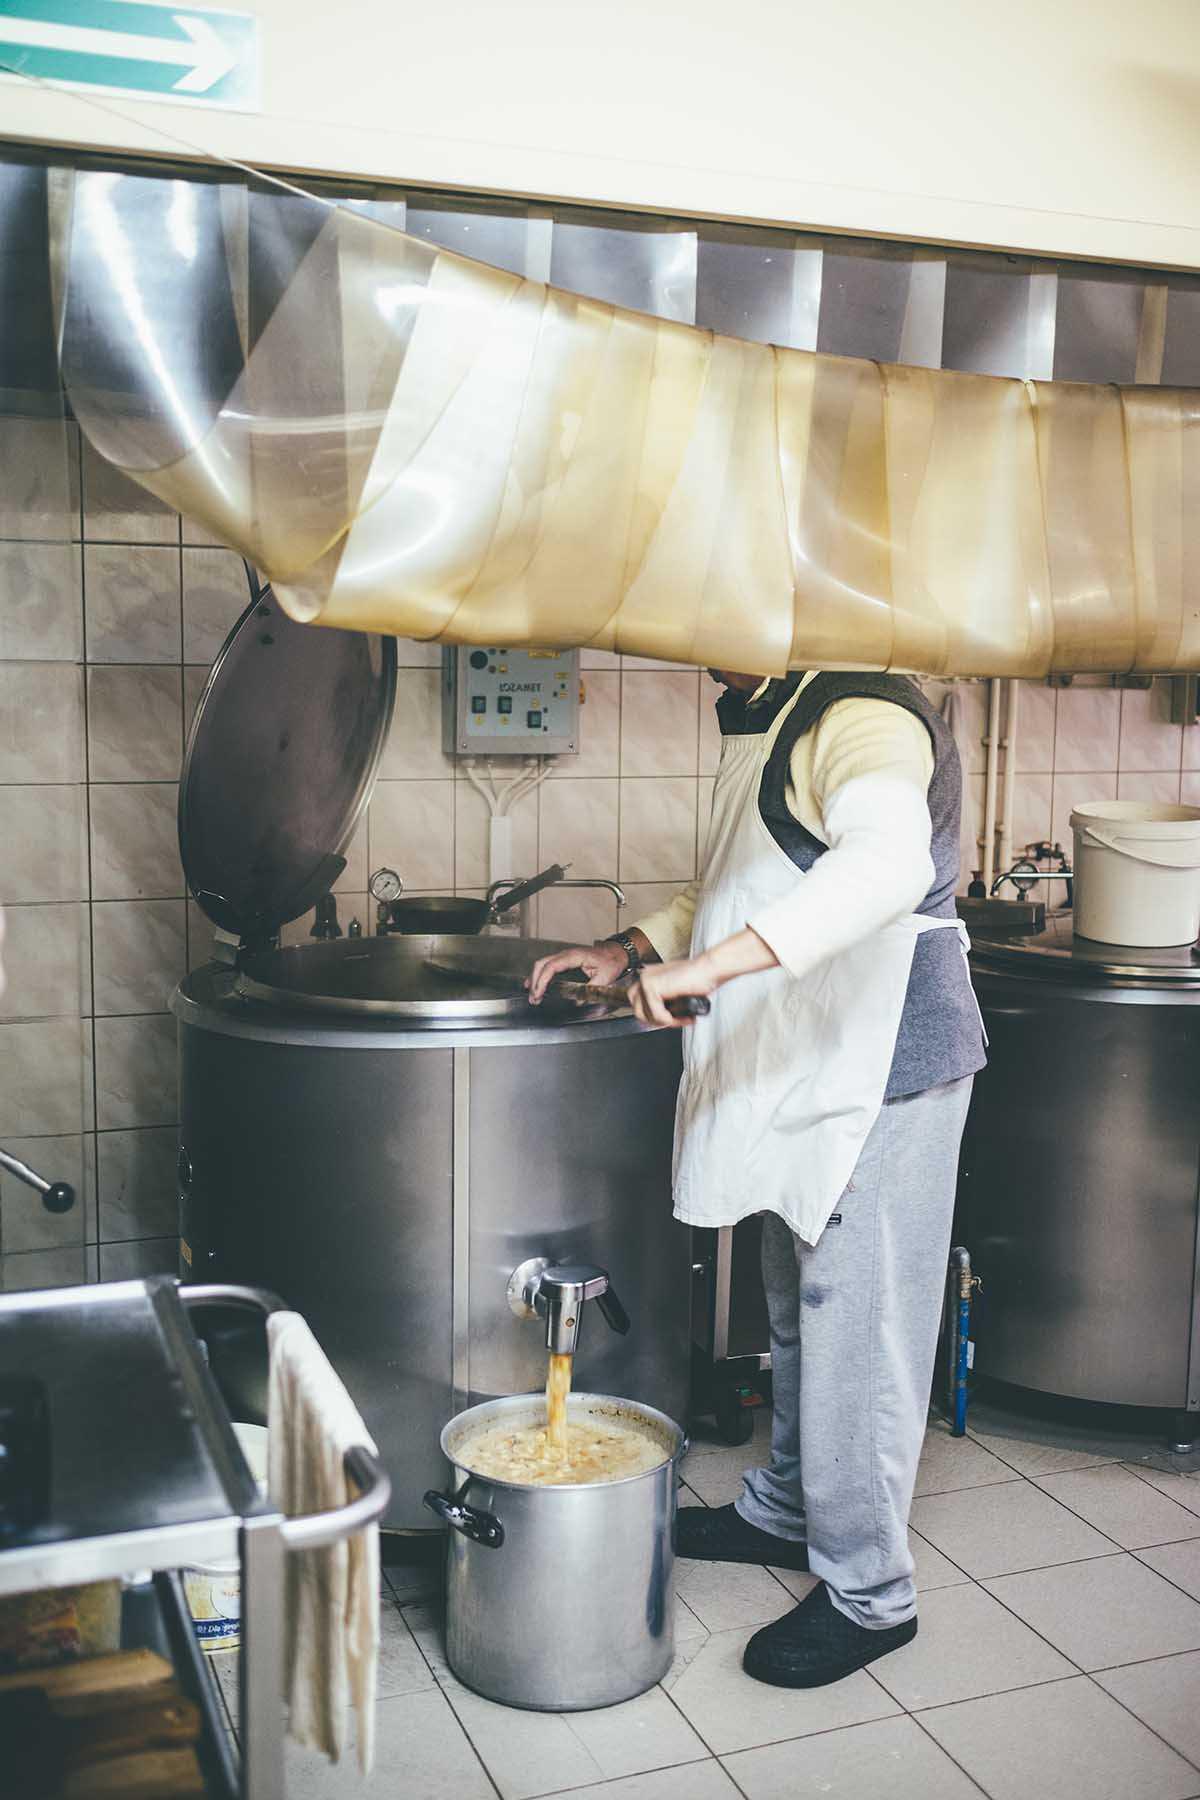 Kuchnia dla ubogich